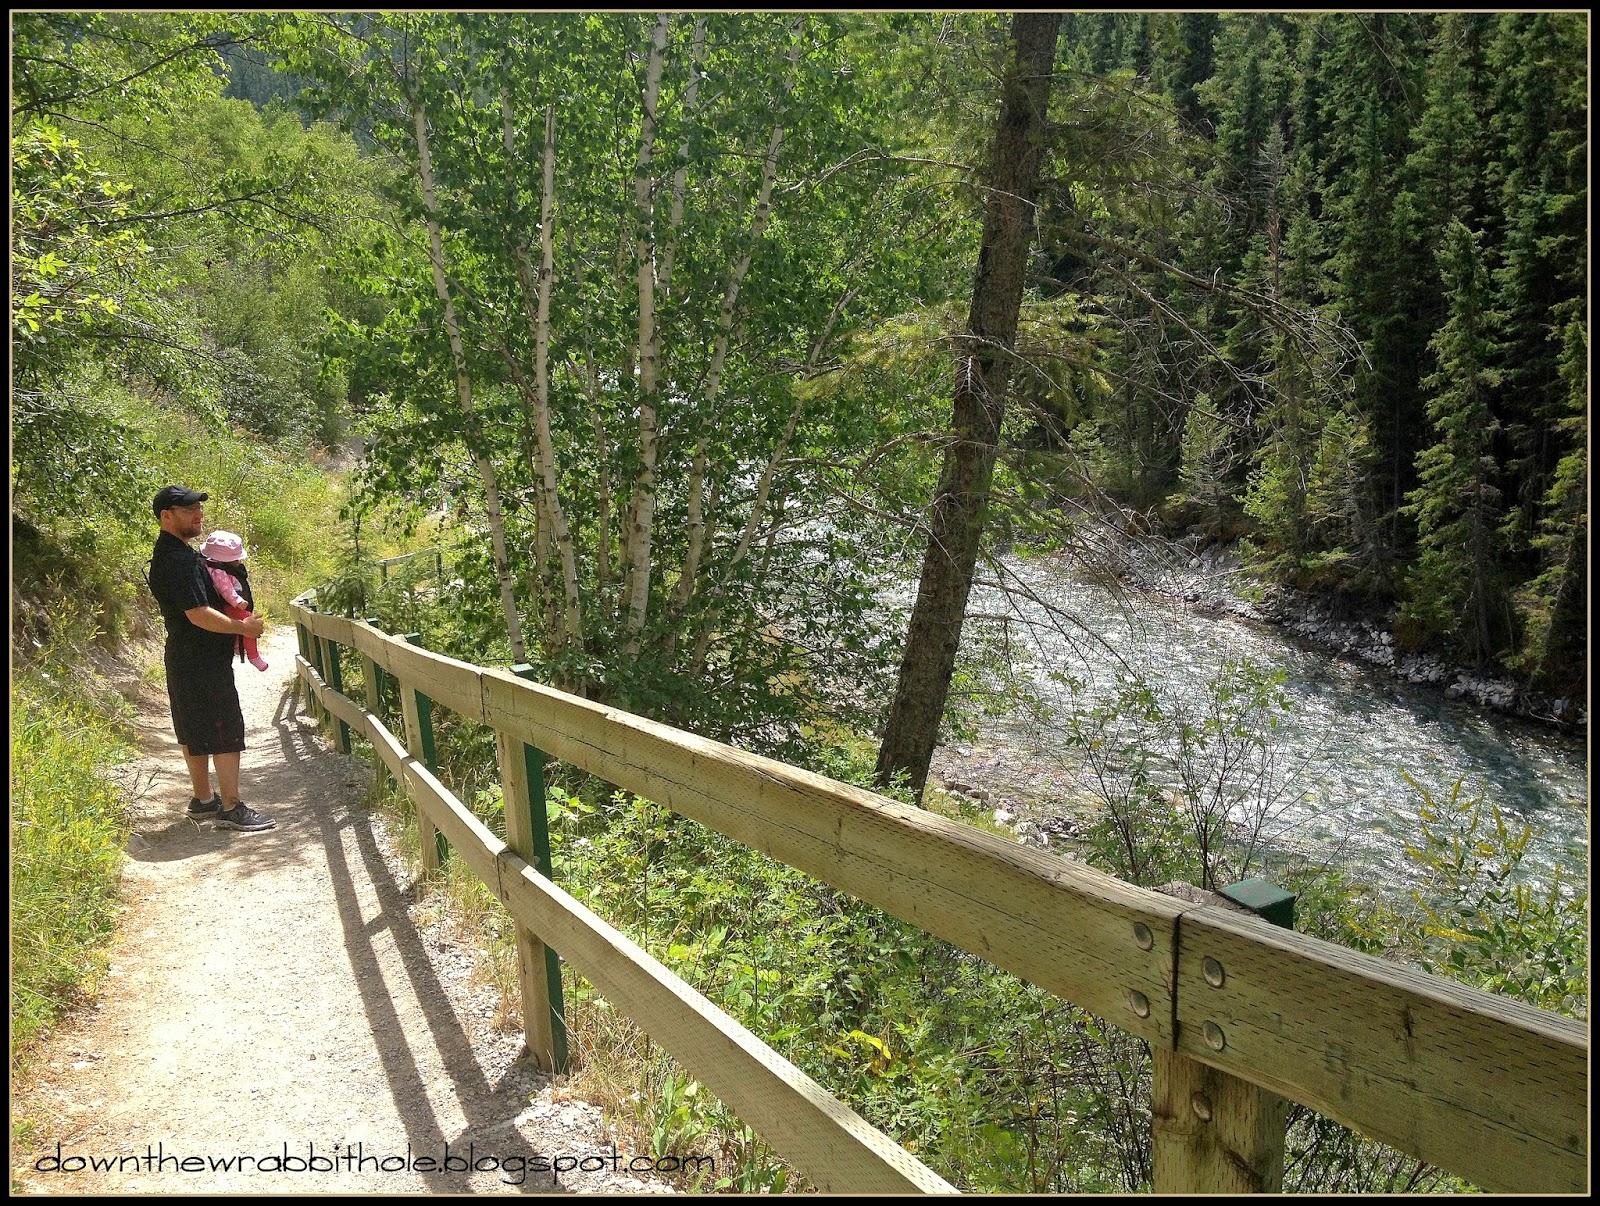 Lussier River, Whiteswan Provincial Park, natural hot springs, British Columbia